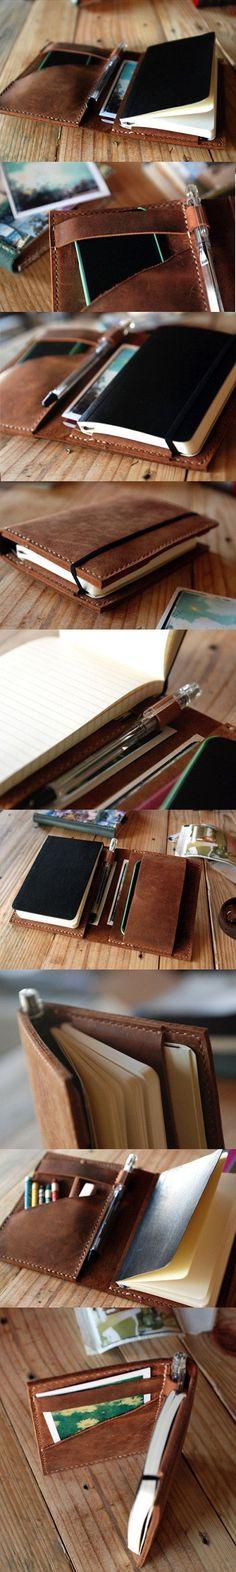 pens, tablet/phone, notebook...